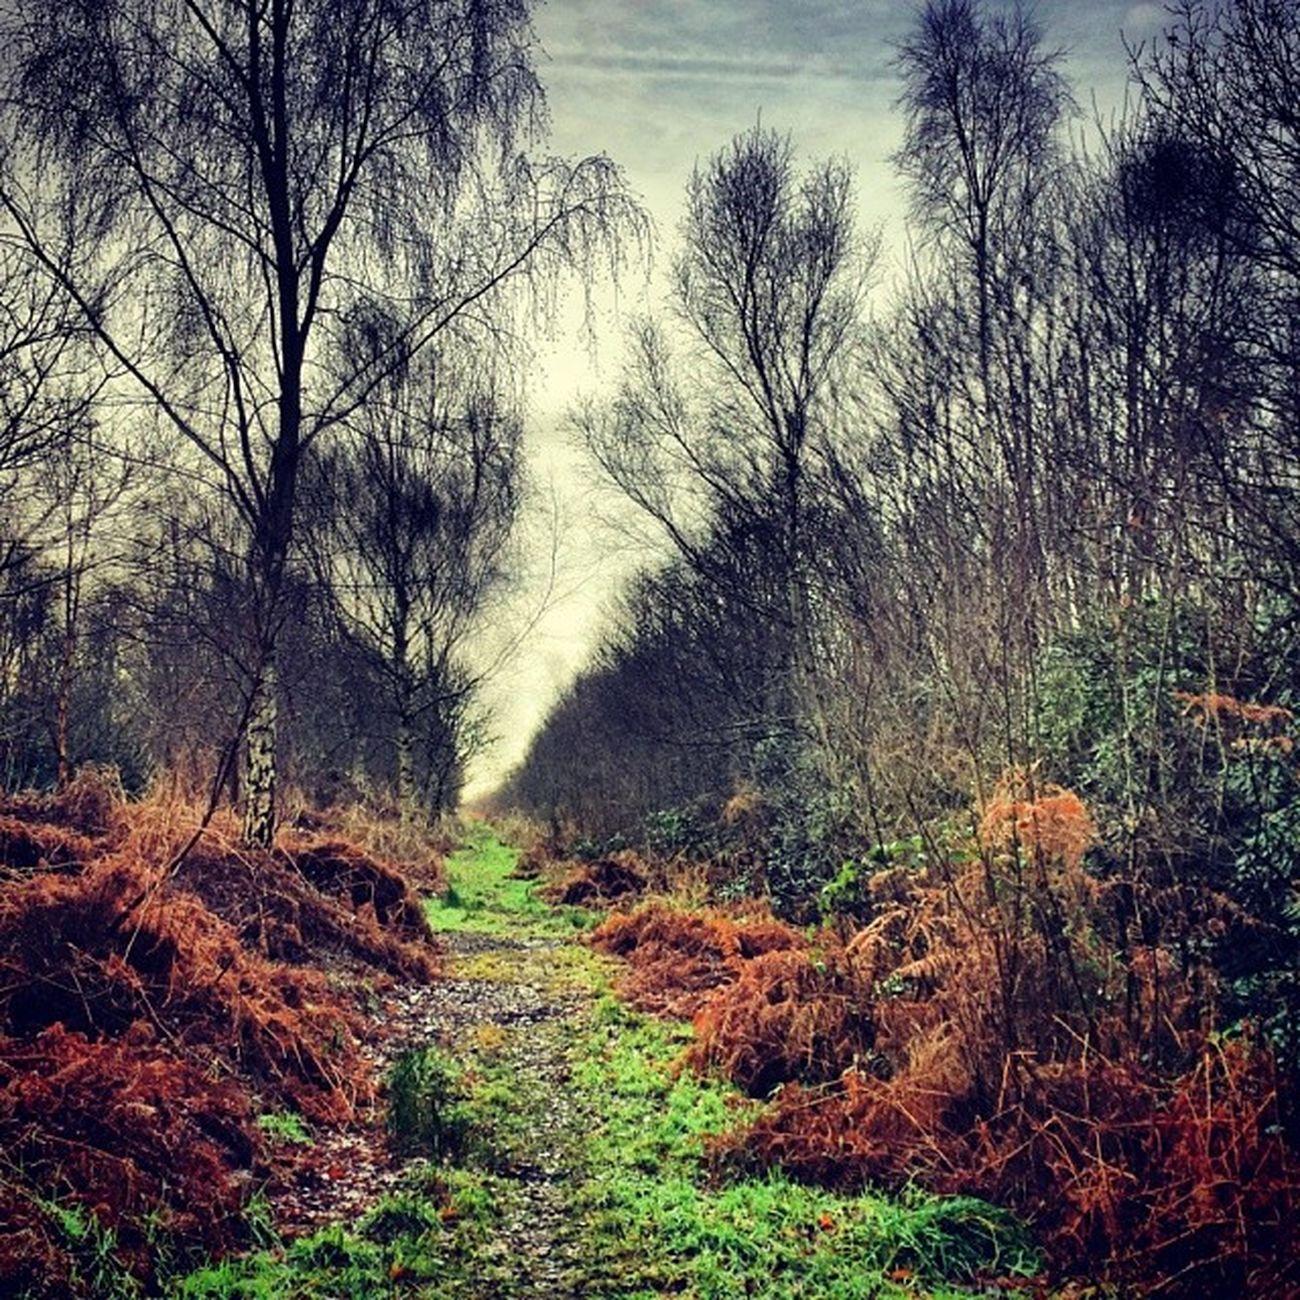 Love my walks over the moors